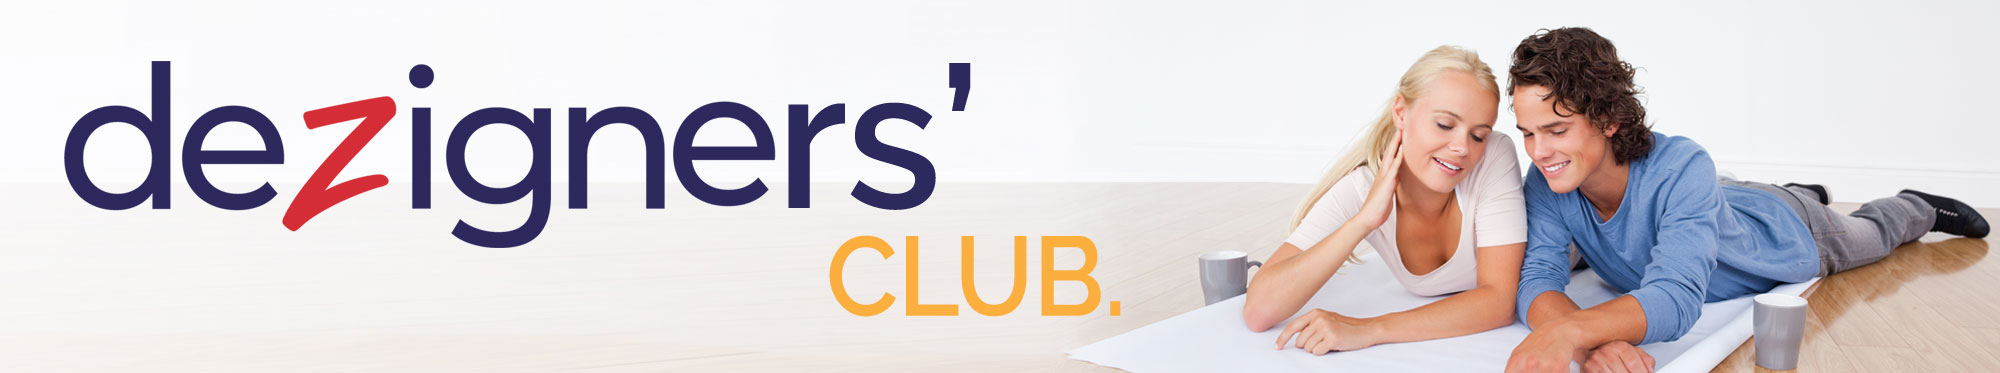 dezigners-club-header-large-.jpg